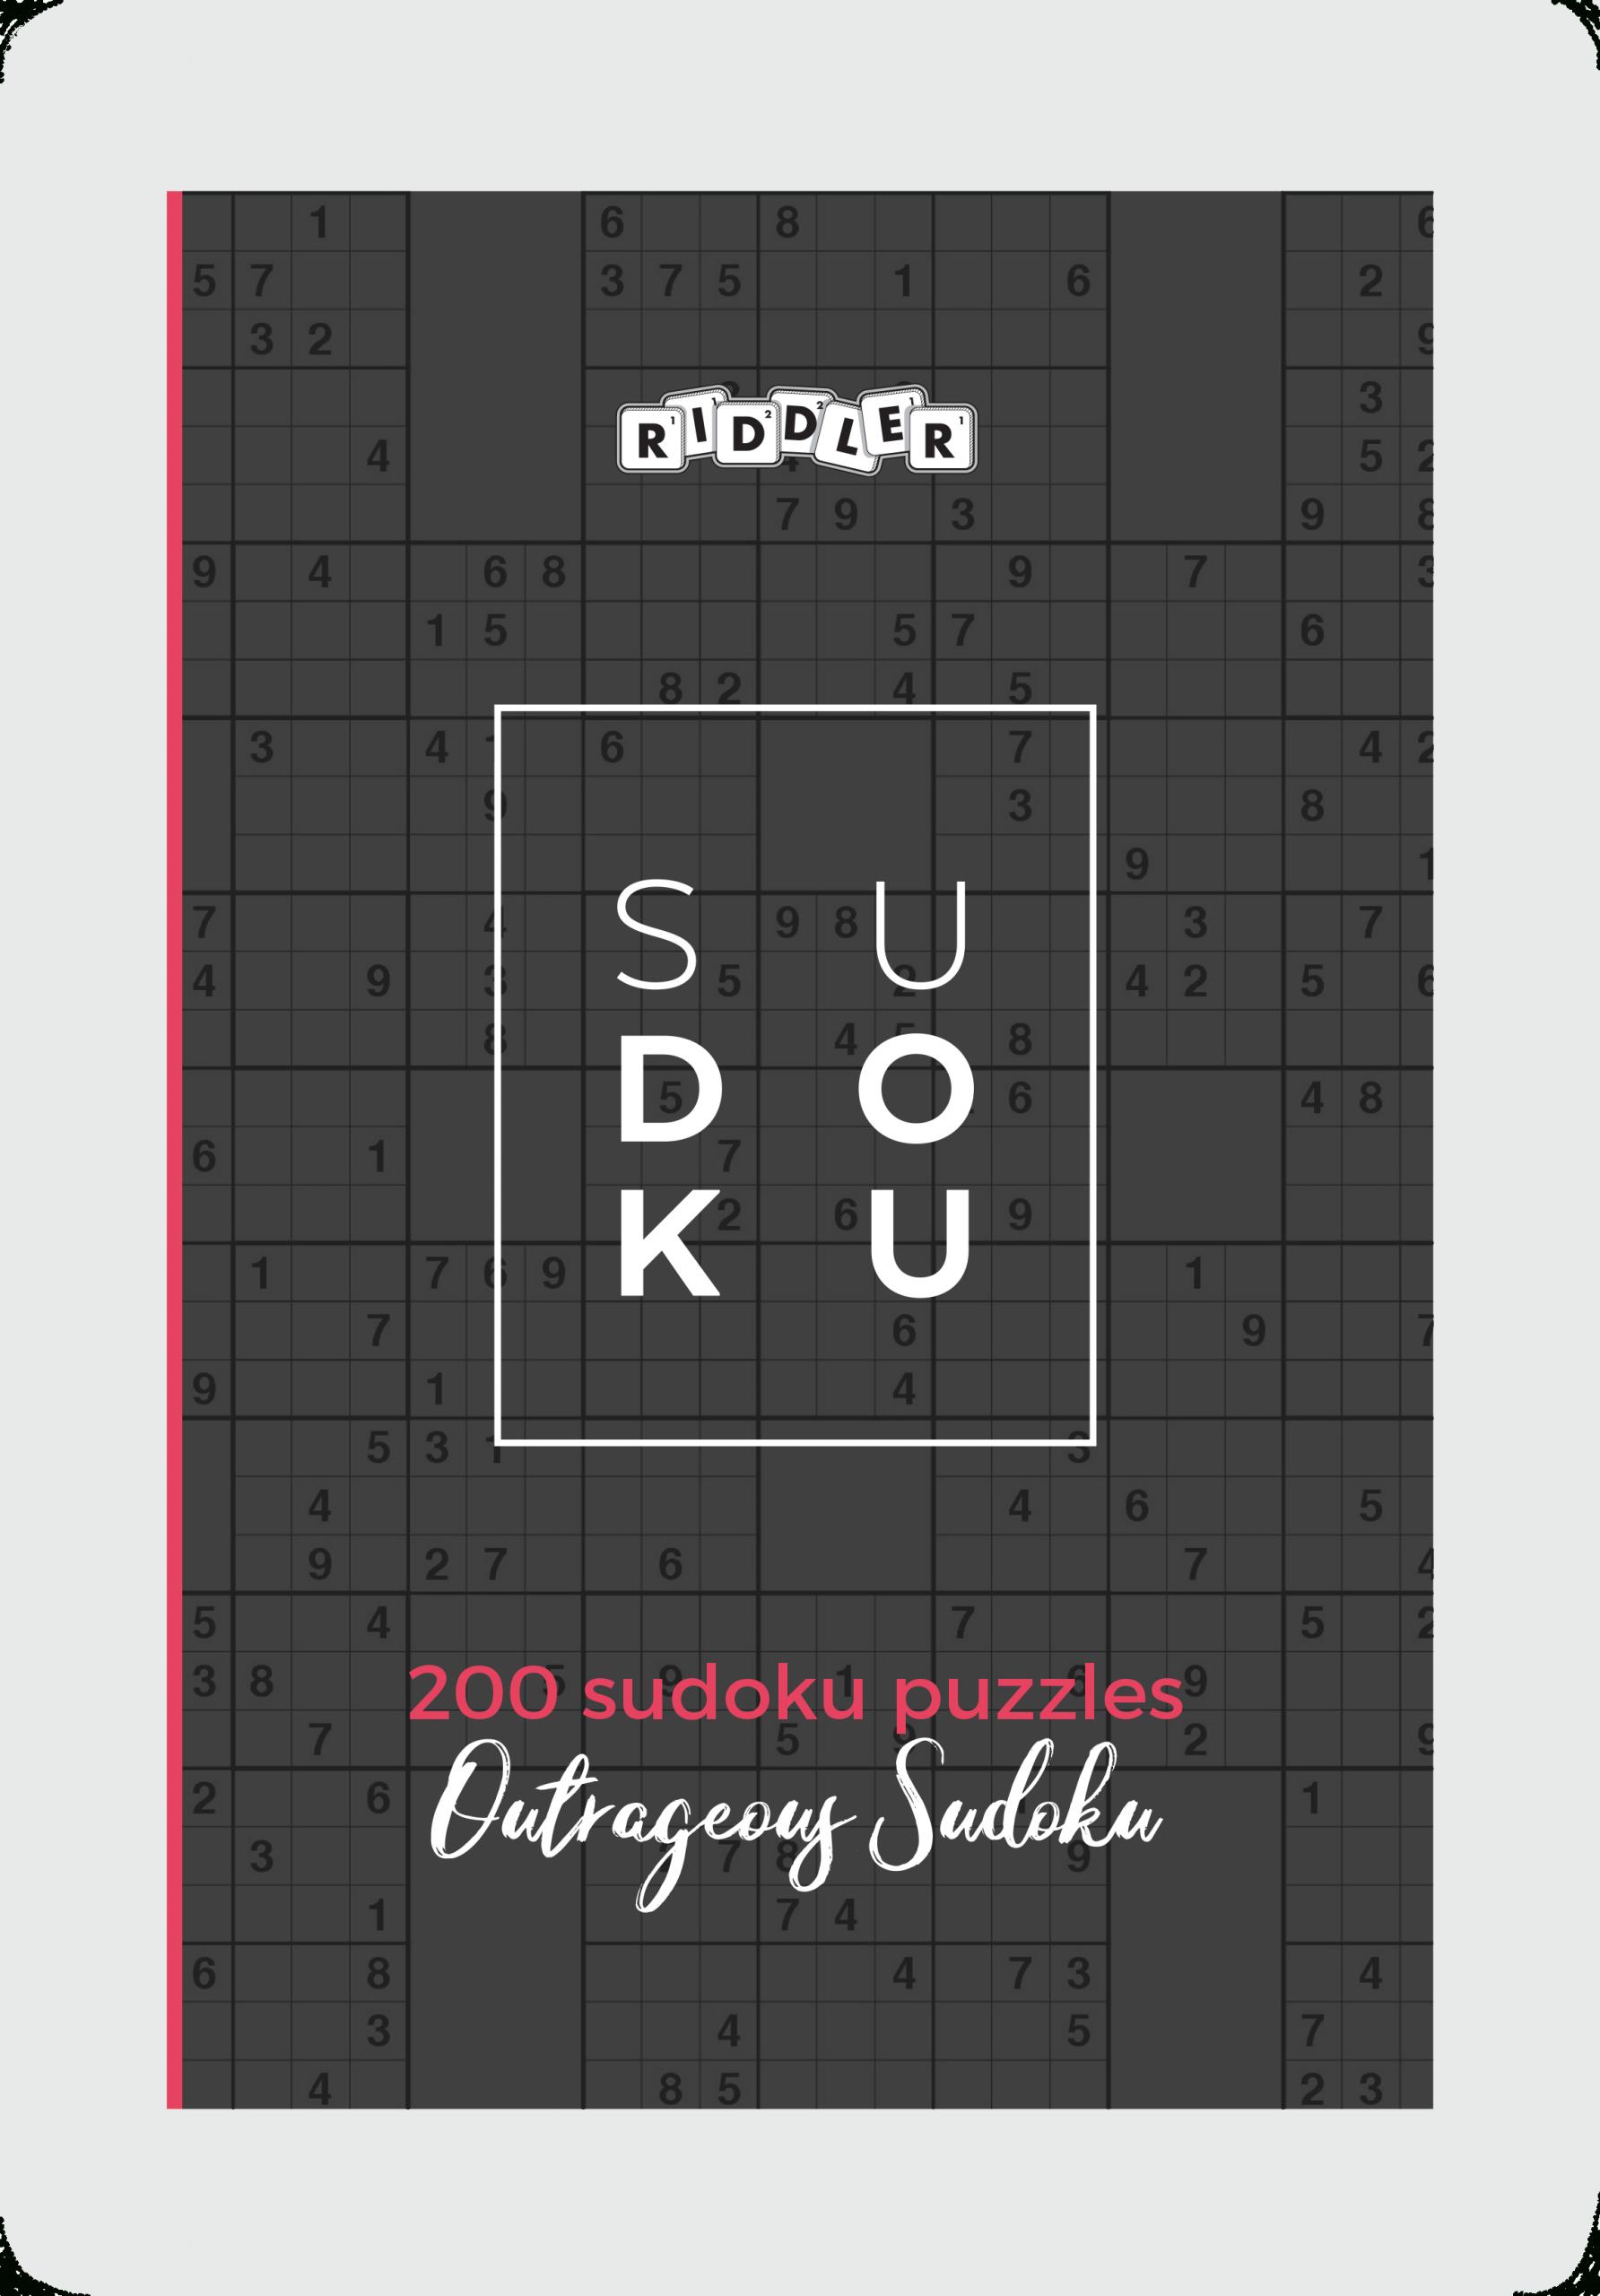 Hard Sudoku Puzzles 200 Tough Sudoku Puzzles Google Drive